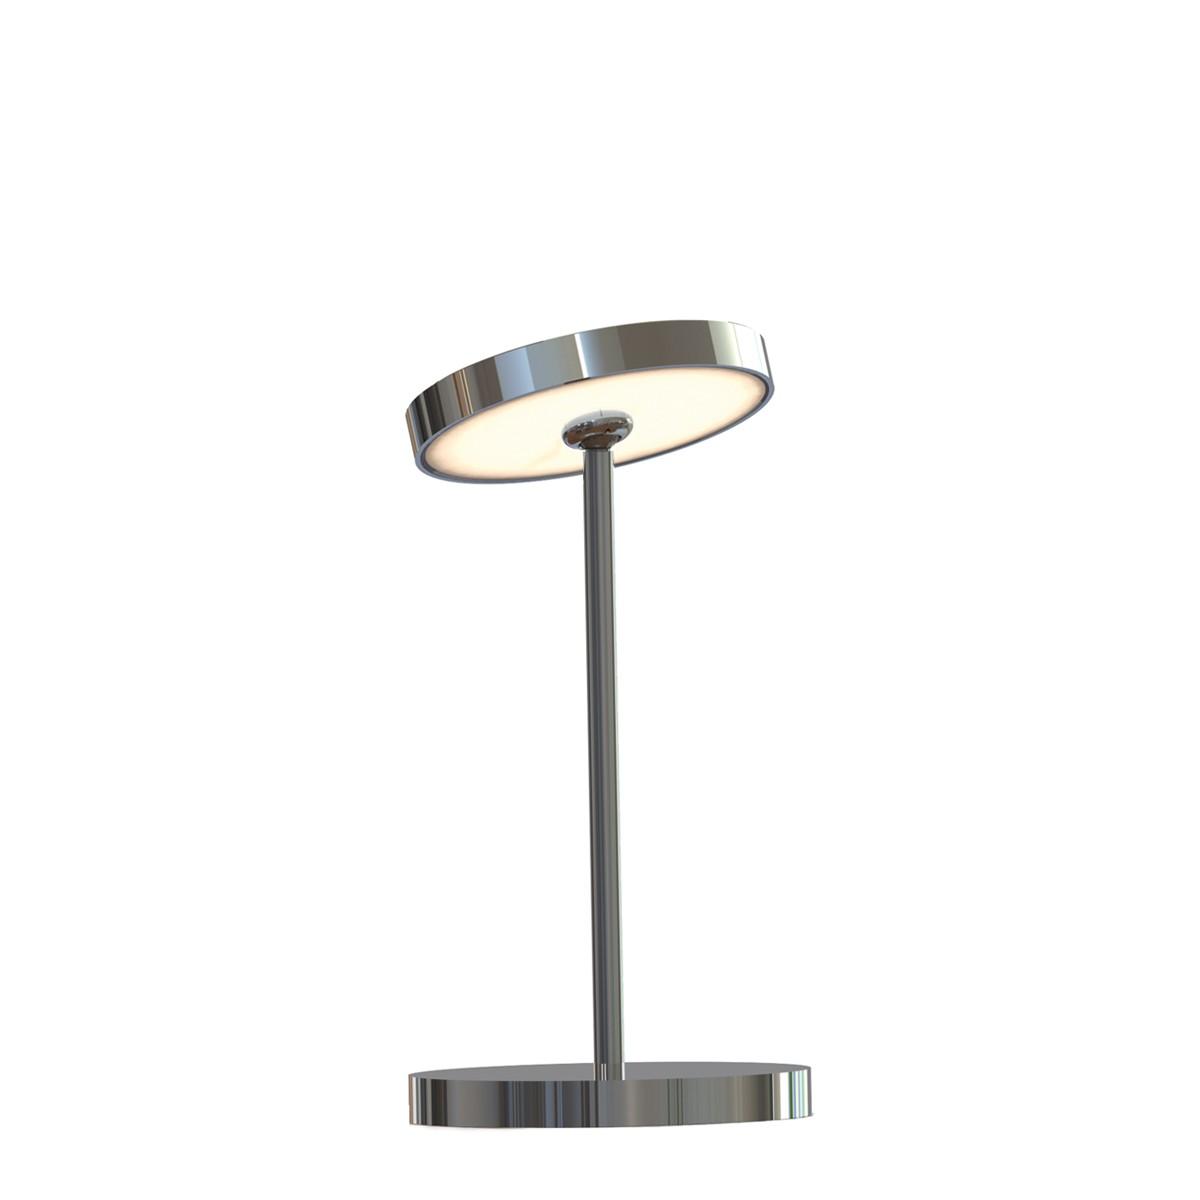 Top Light Sun Table Tischleuchte 20, Ø: 9 cm